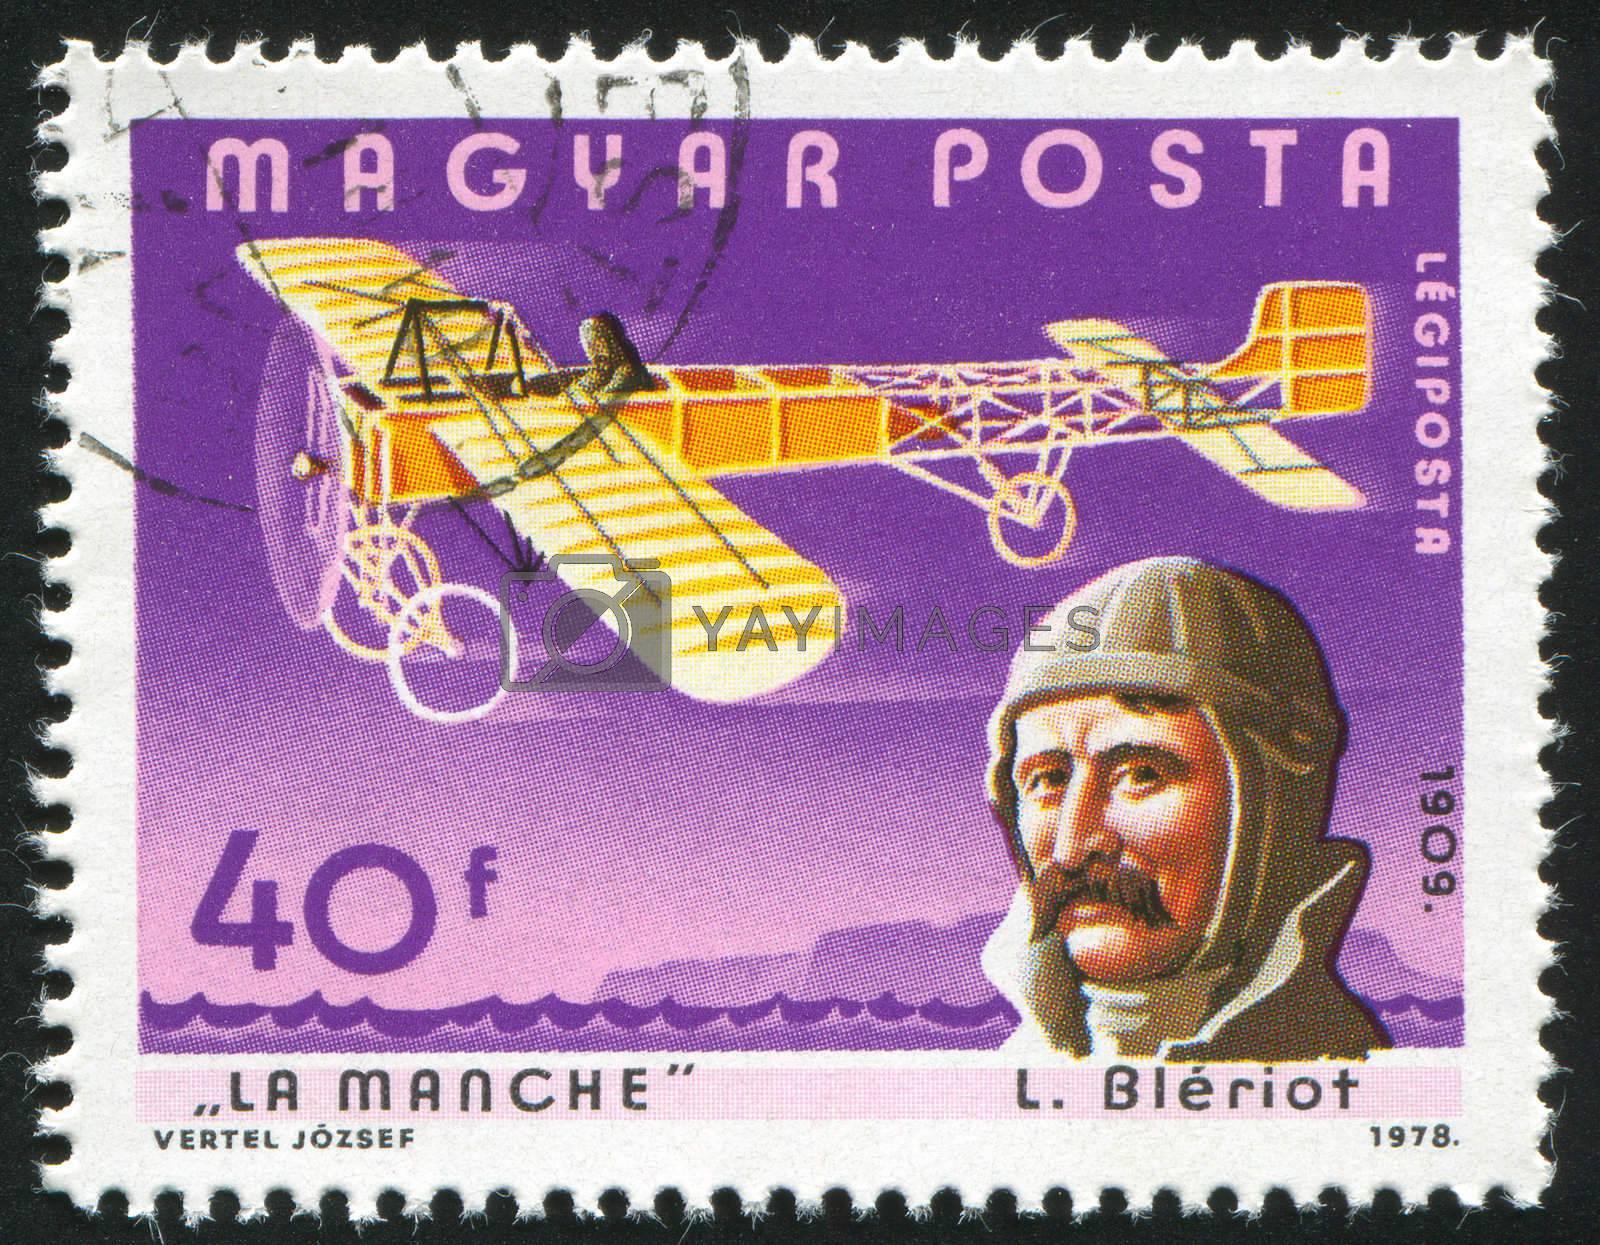 HUNGARY - CIRCA 1978: stamp printed by Hungary, shows aeroplane, Louis Bleriot, circa 1978